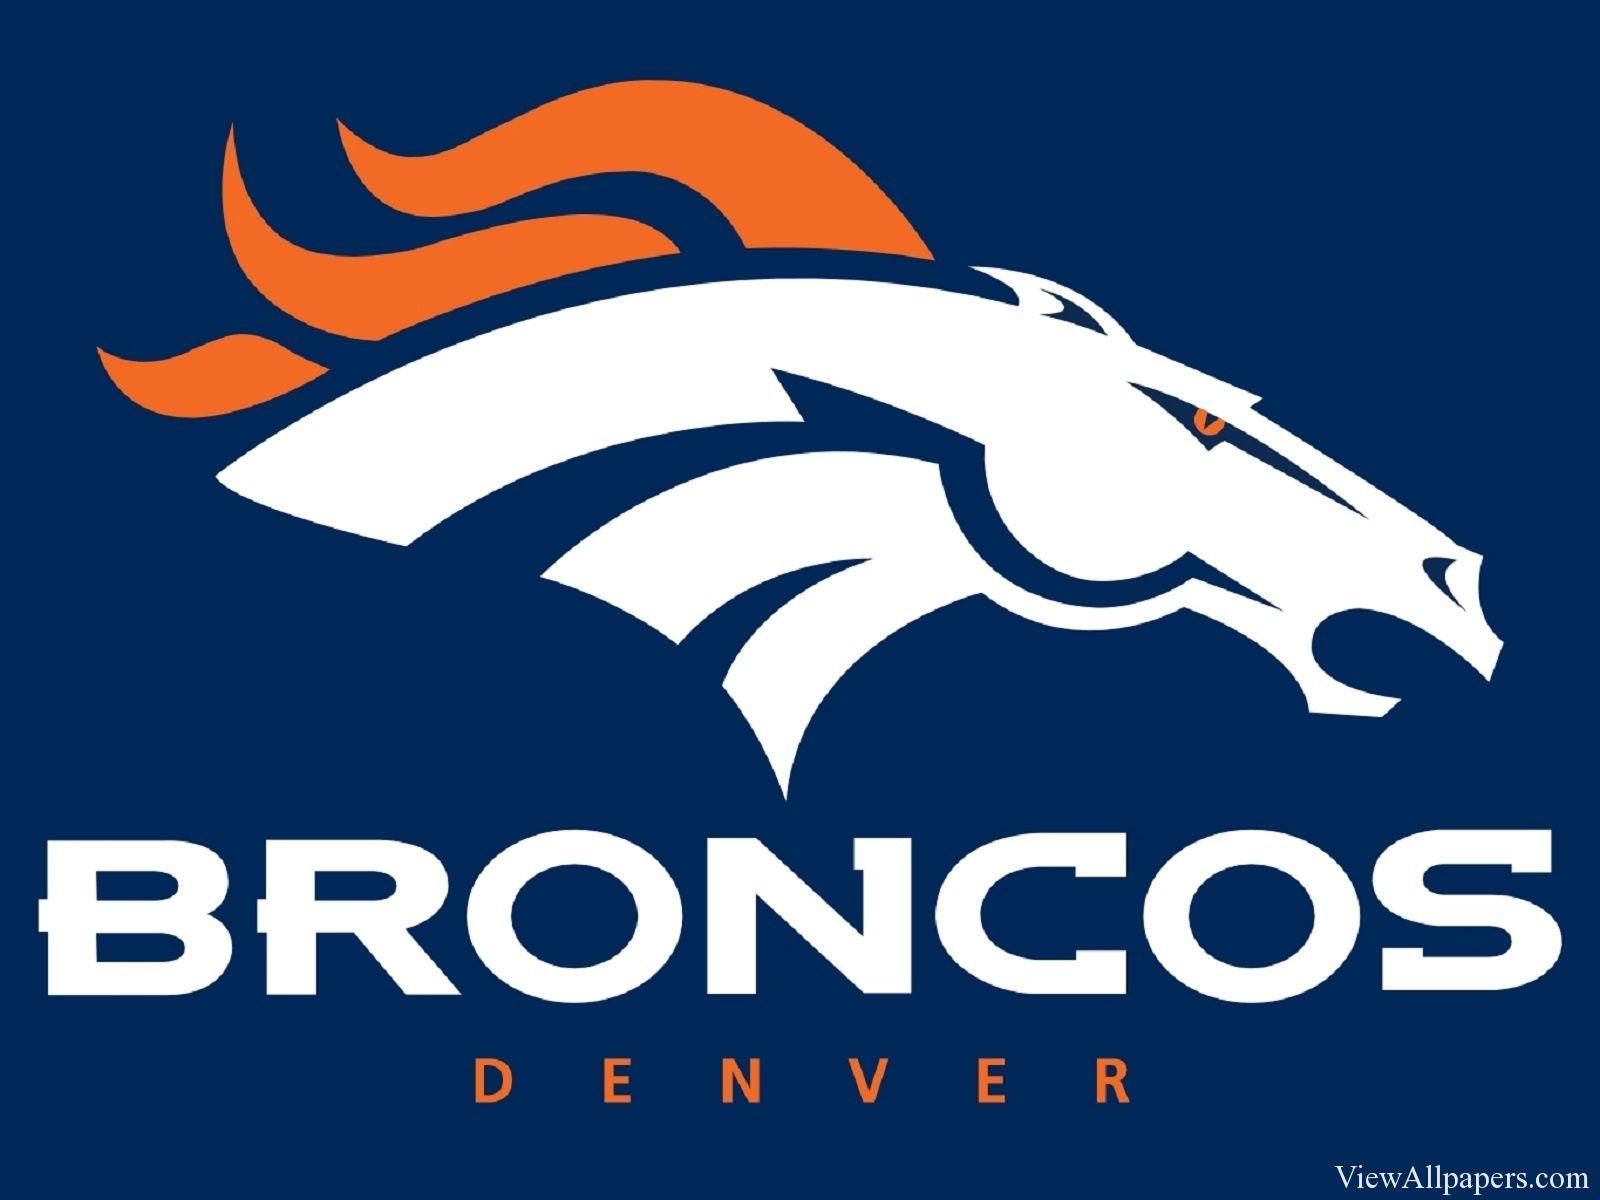 denver broncos logo wallpaper viewallpapers pinterest denver rh pinterest com Denver Broncos Logo Clip Art Denver Broncos New Logo